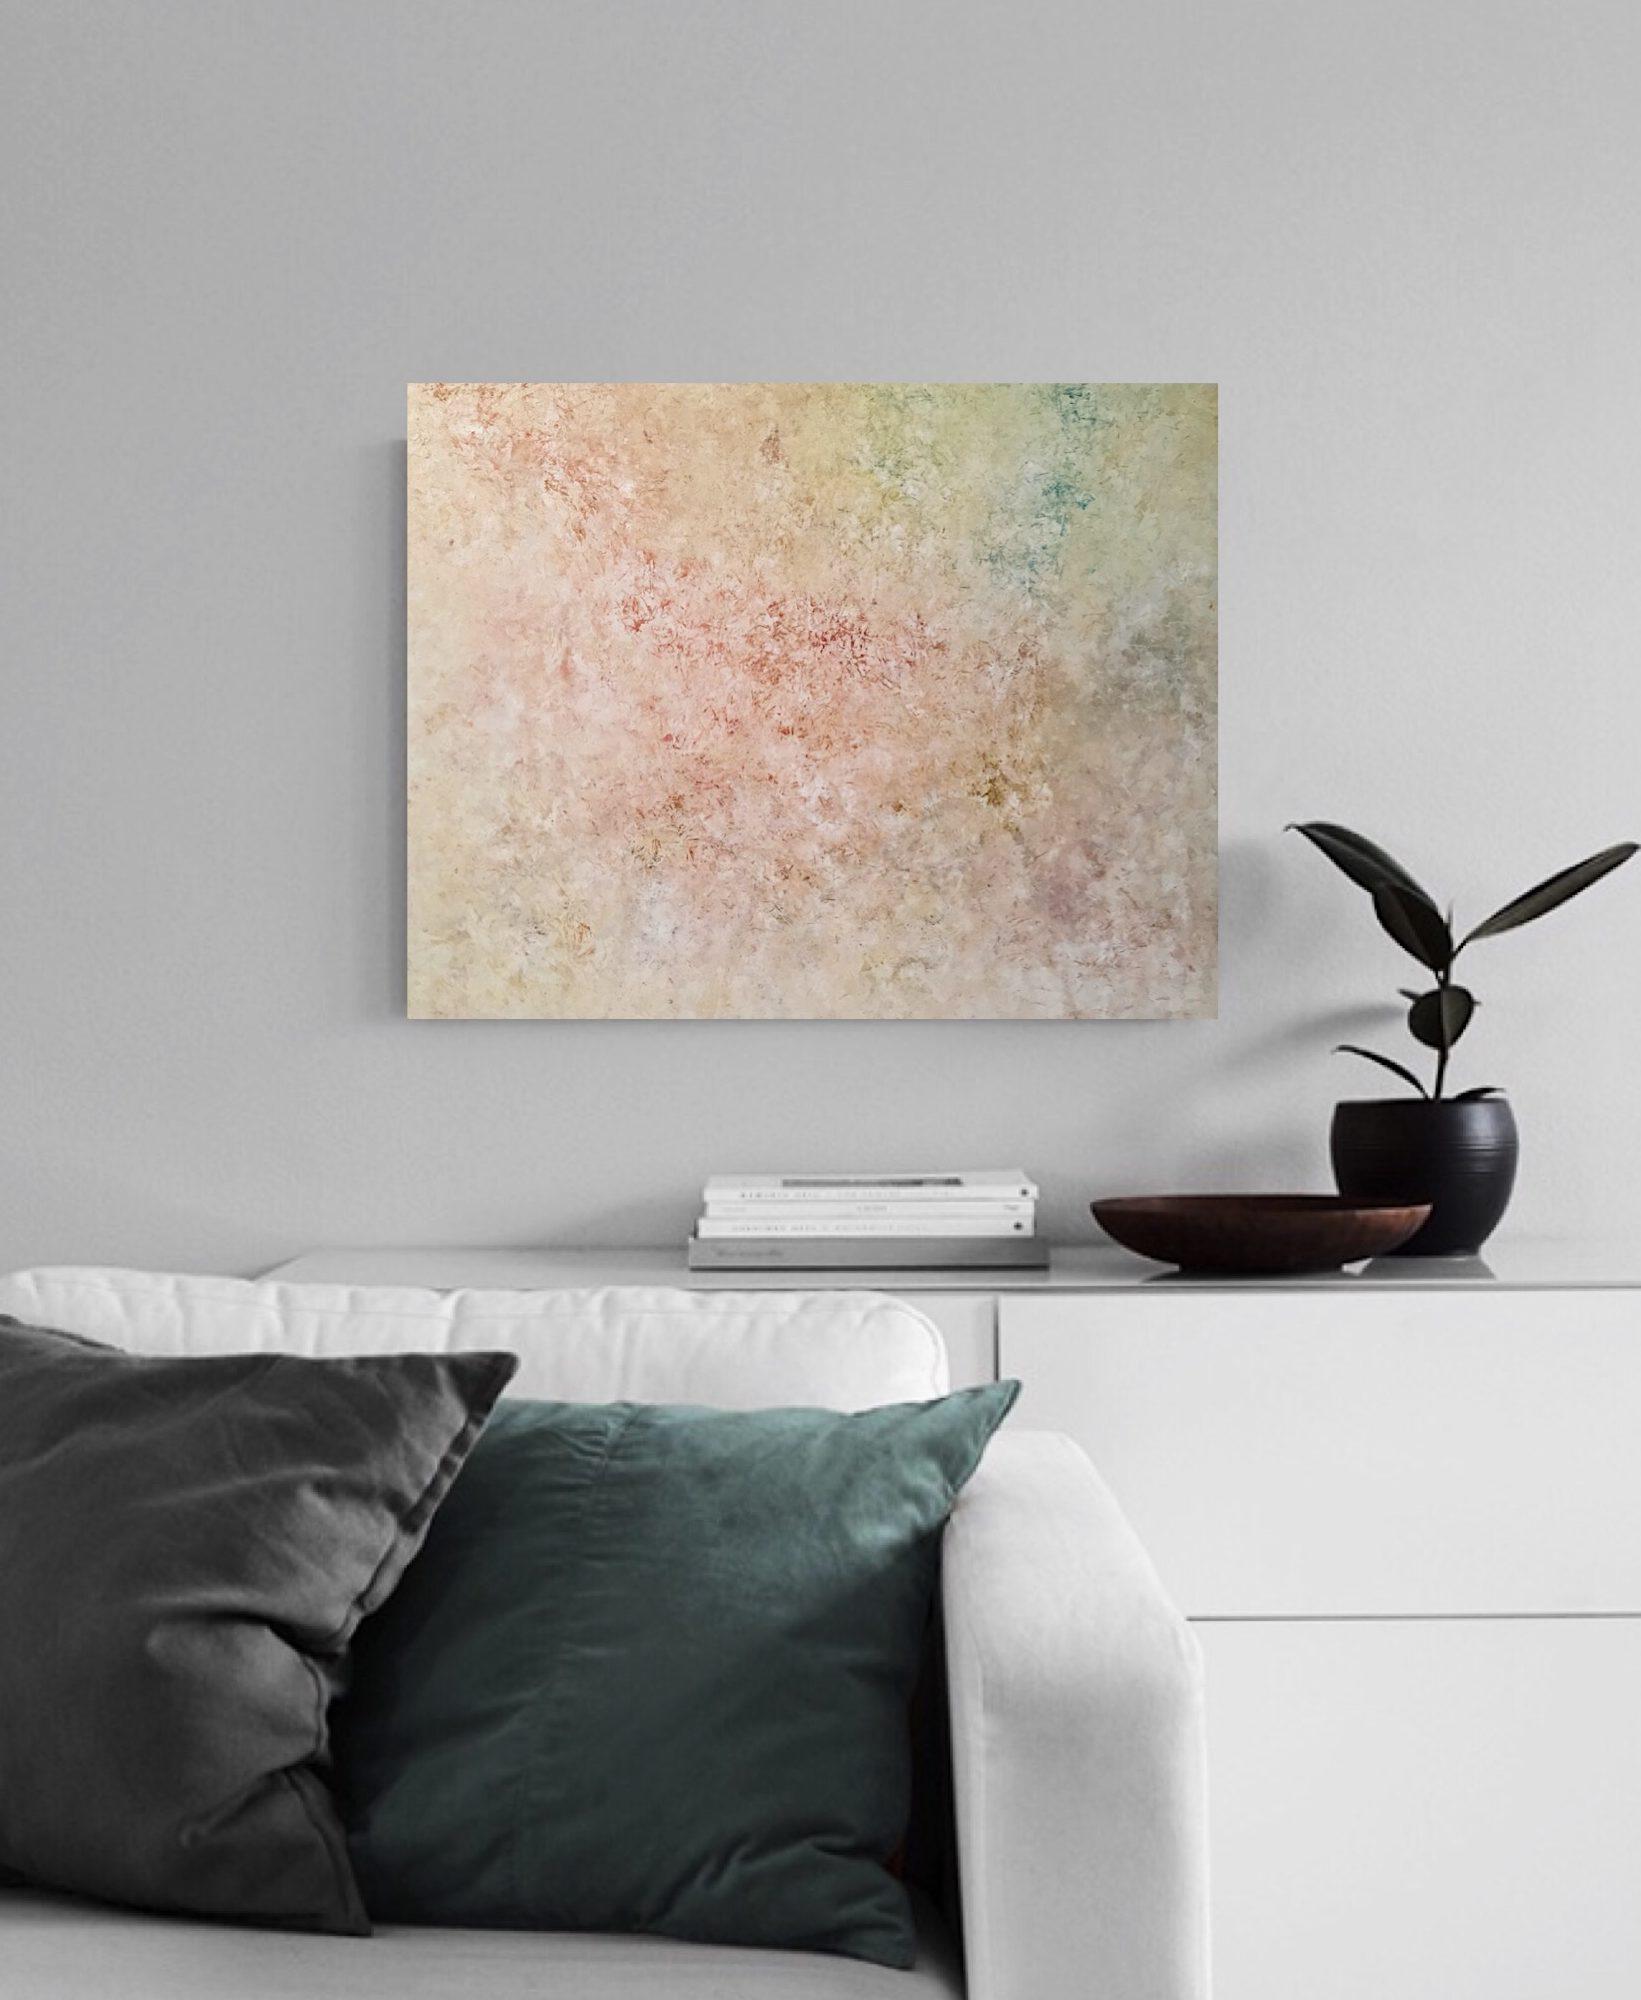 Marine Bonzom - Artiste Peintre Biarritz - Home - Romy